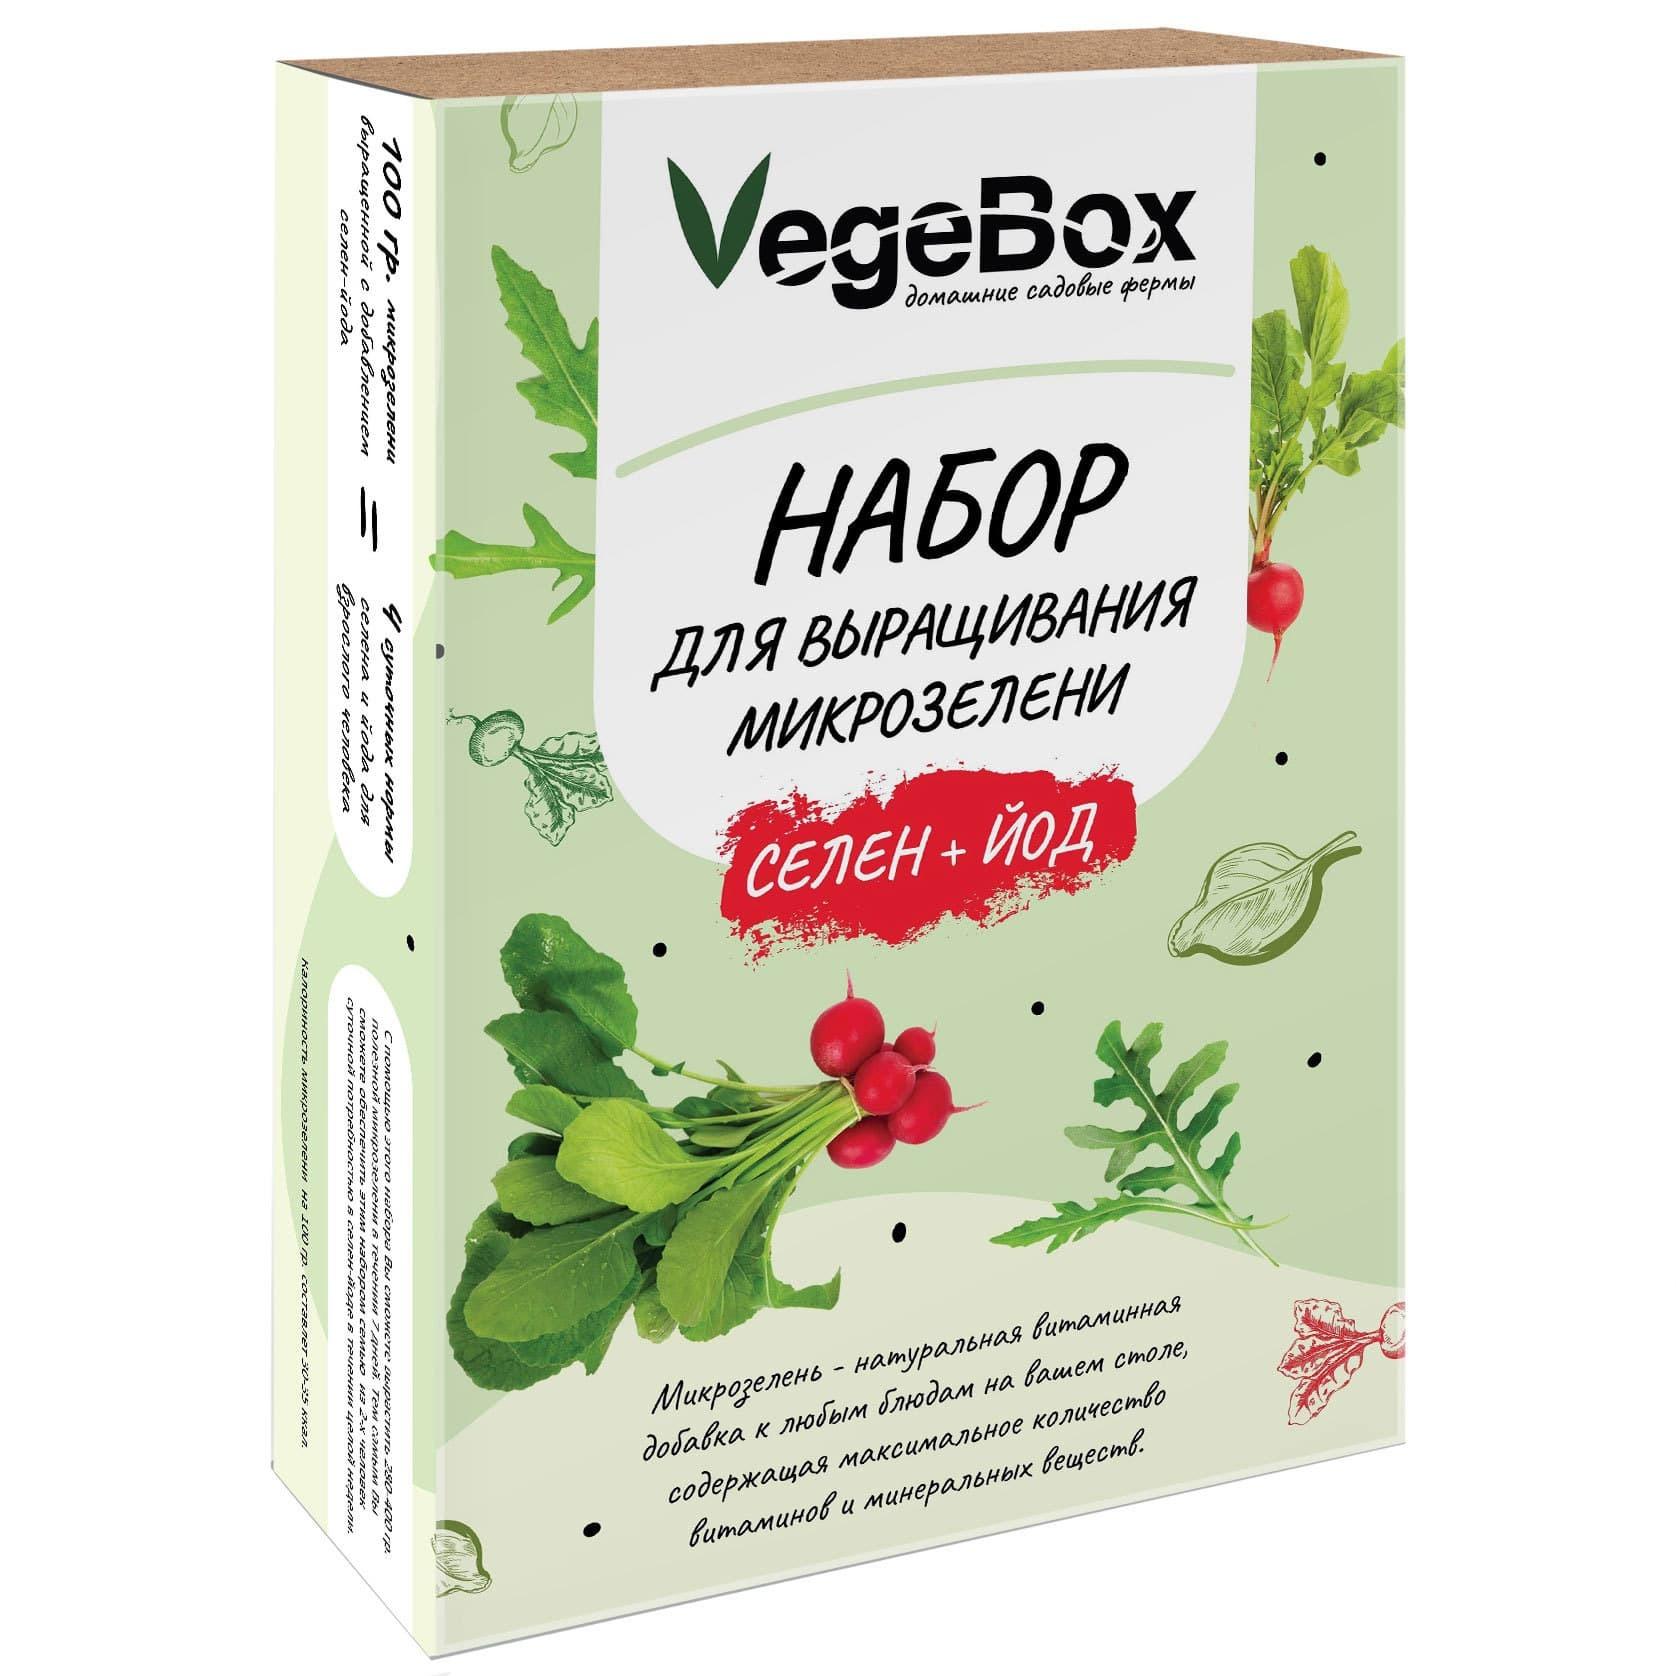 Набор для выращивания микрозелени VegeBox Селен+Йод «Микс» (редис, руккола, горчица)